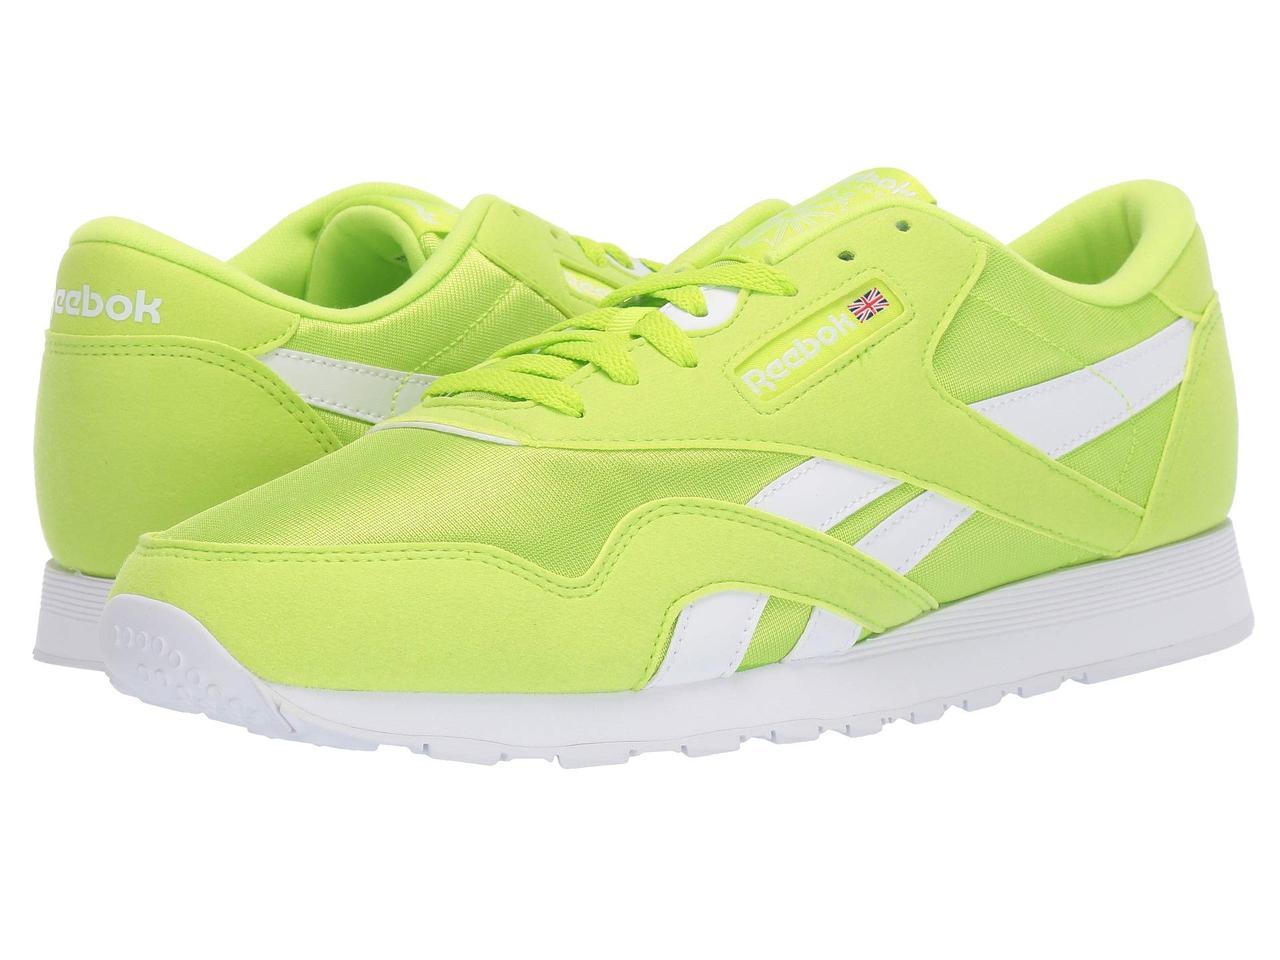 6ddbcbf0c1c0 Кроссовки/Кеды (Оригинал) Reebok Lifestyle Classic Nylon Color Neon Lime/ White -